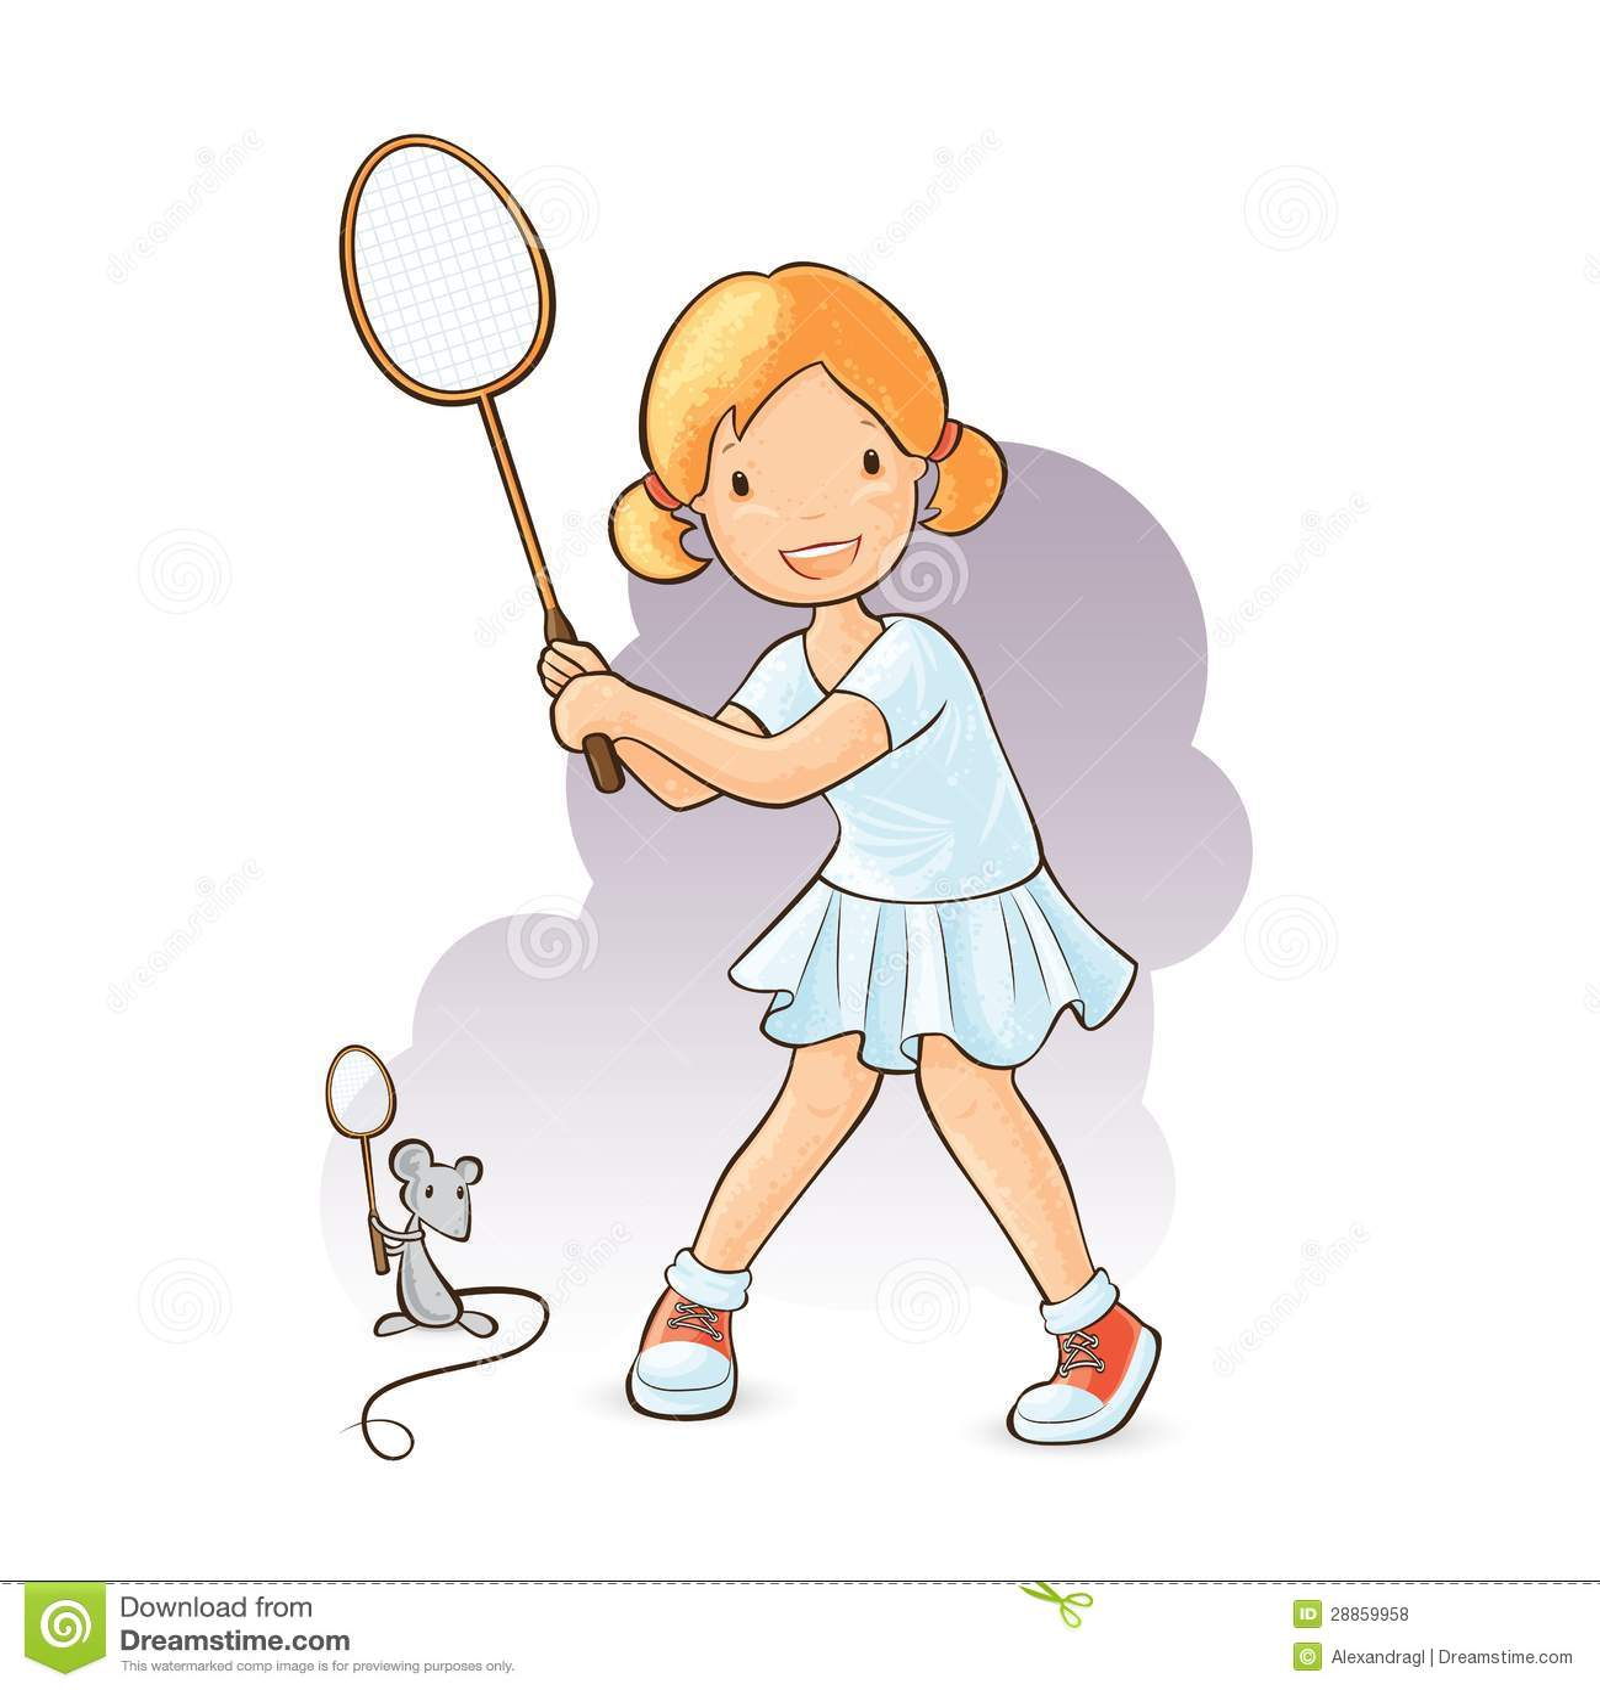 essay my favorite sport badminton